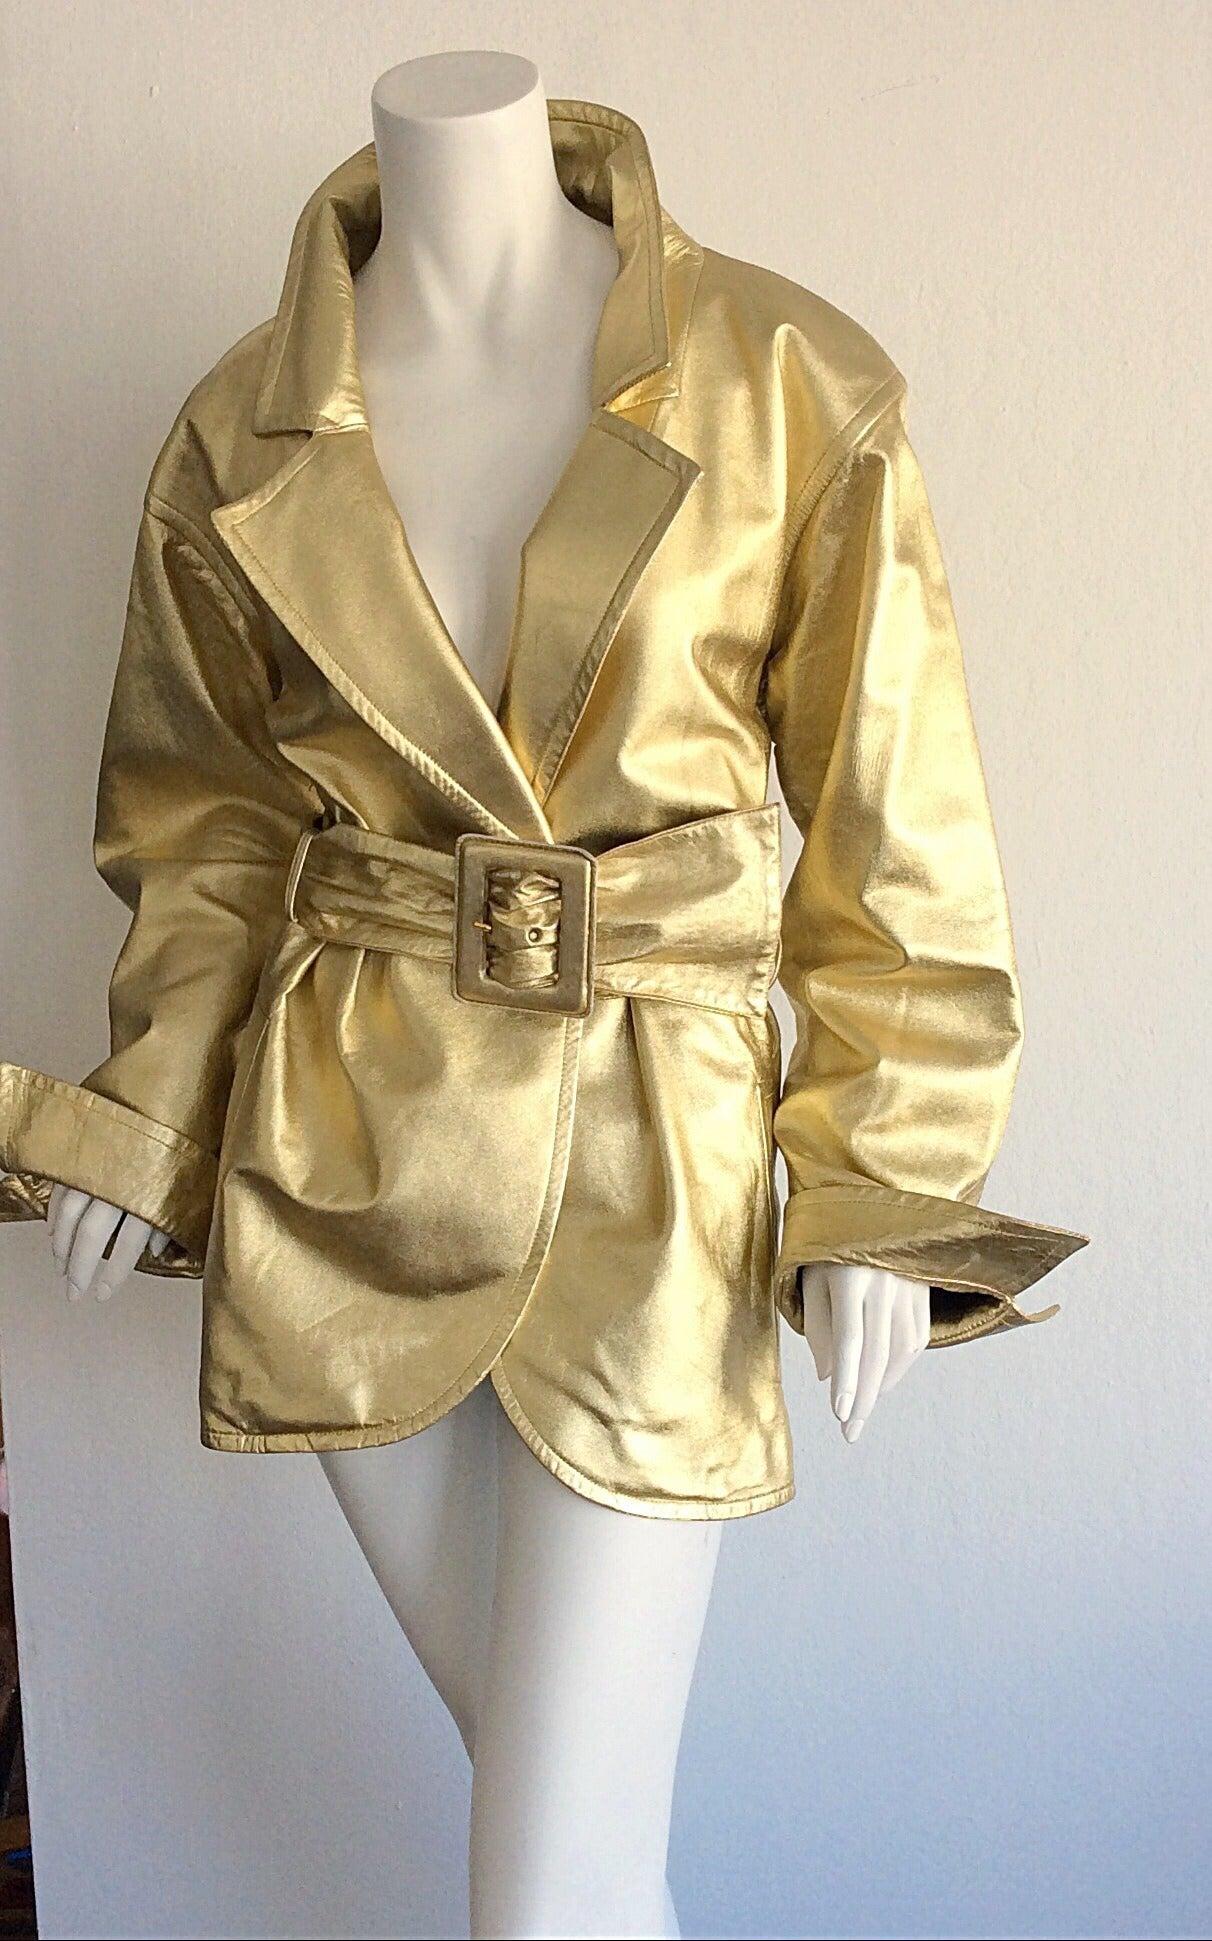 Vintage Yves Saint Laurent ' Rive Gauche ' Belted Gold Leather Jacket 8